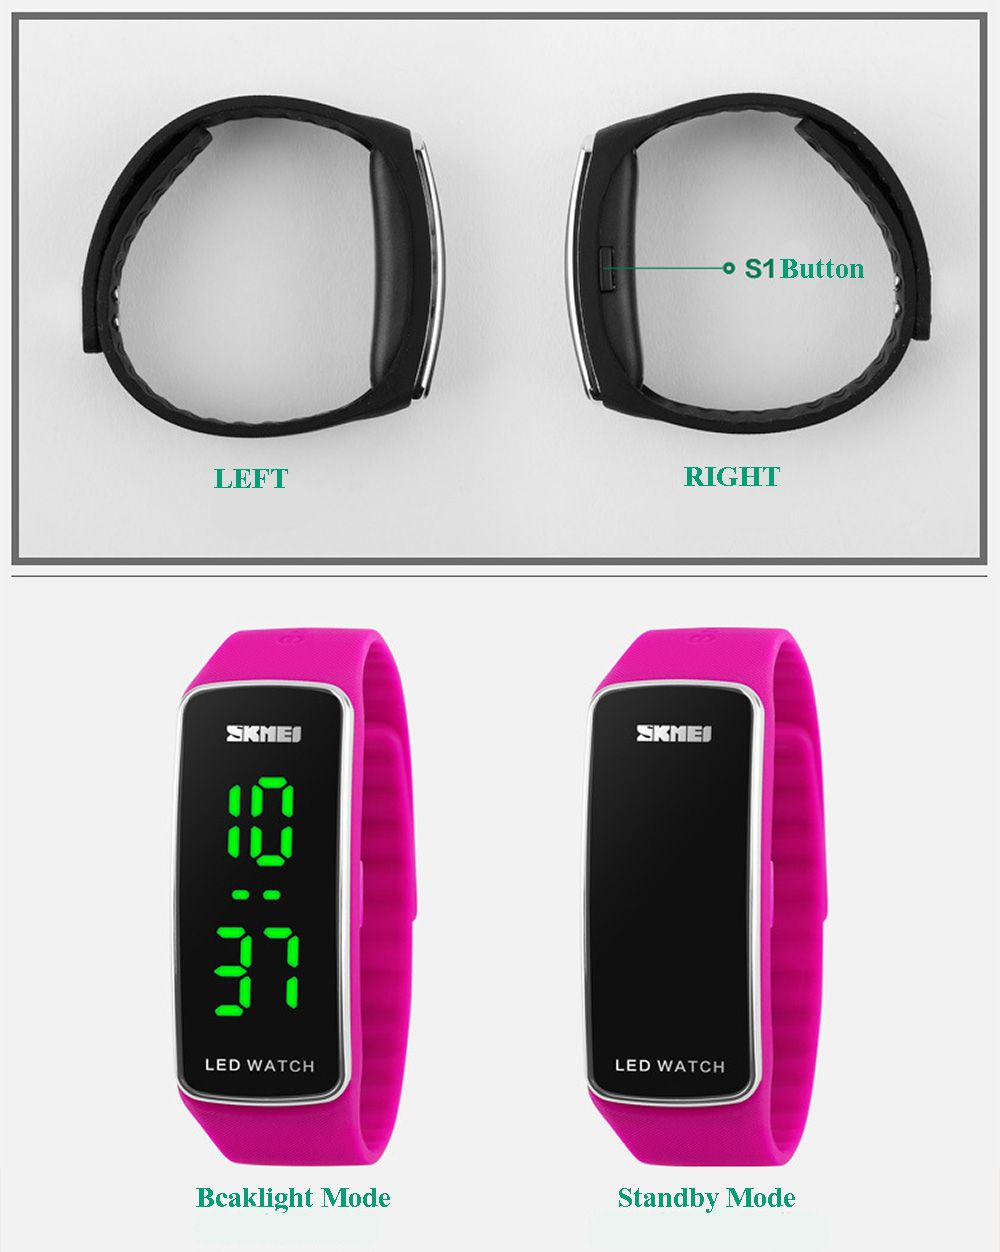 Skmei 1119 LED Light Sports Watch Silicone Strap Unisex Wristwatch Water Resistance